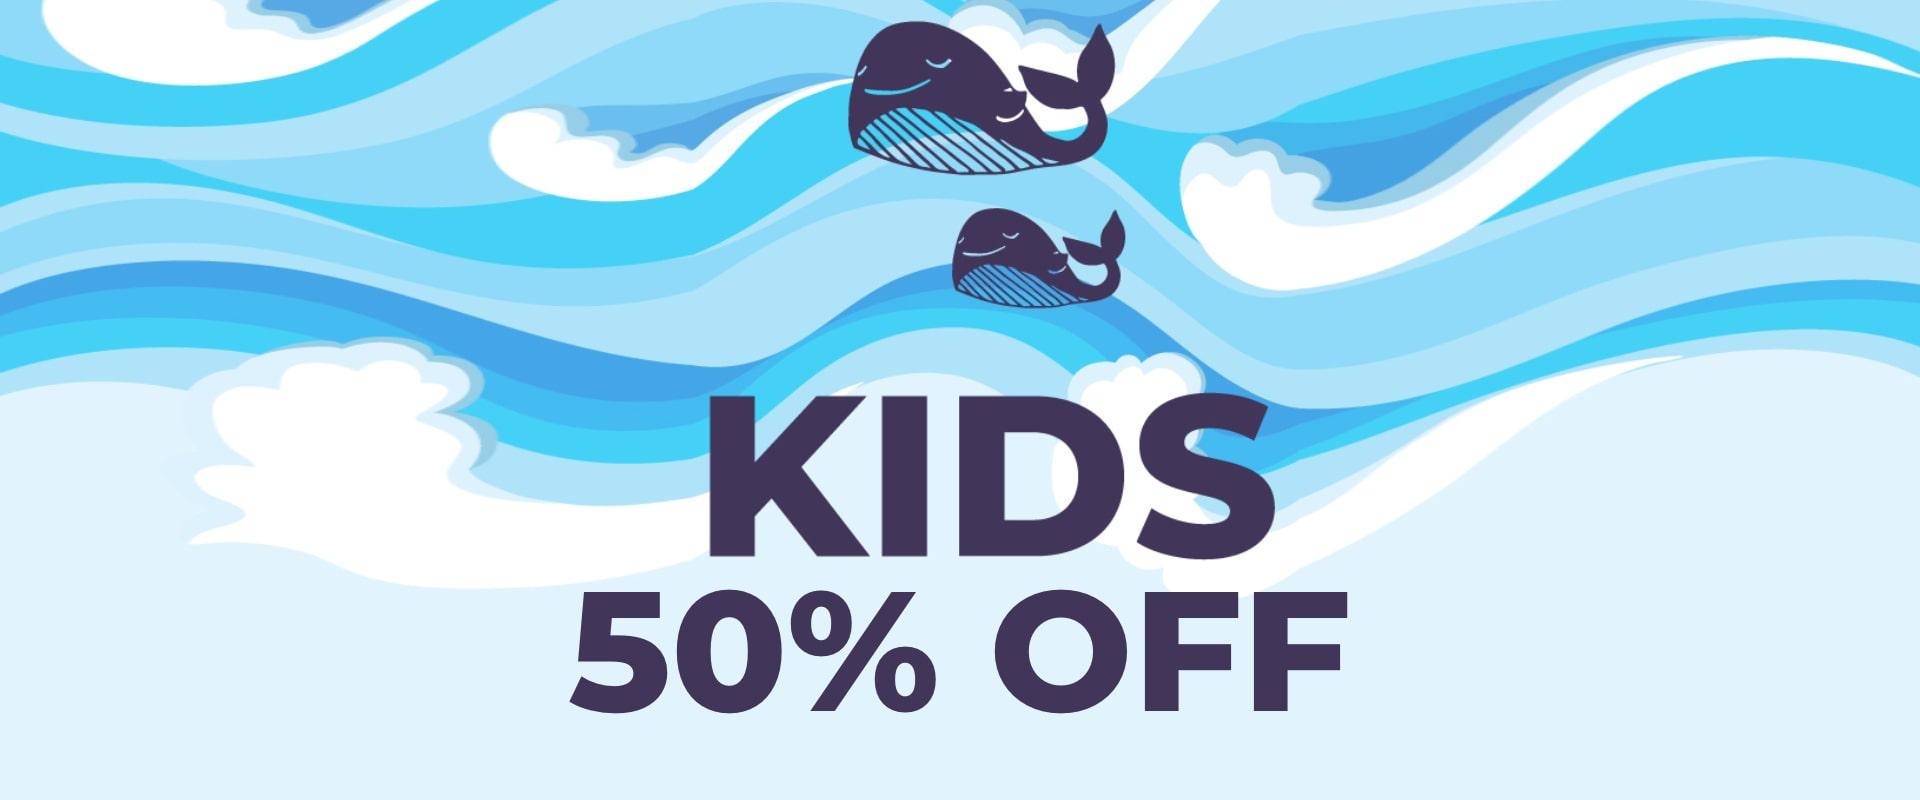 Kids 50% off